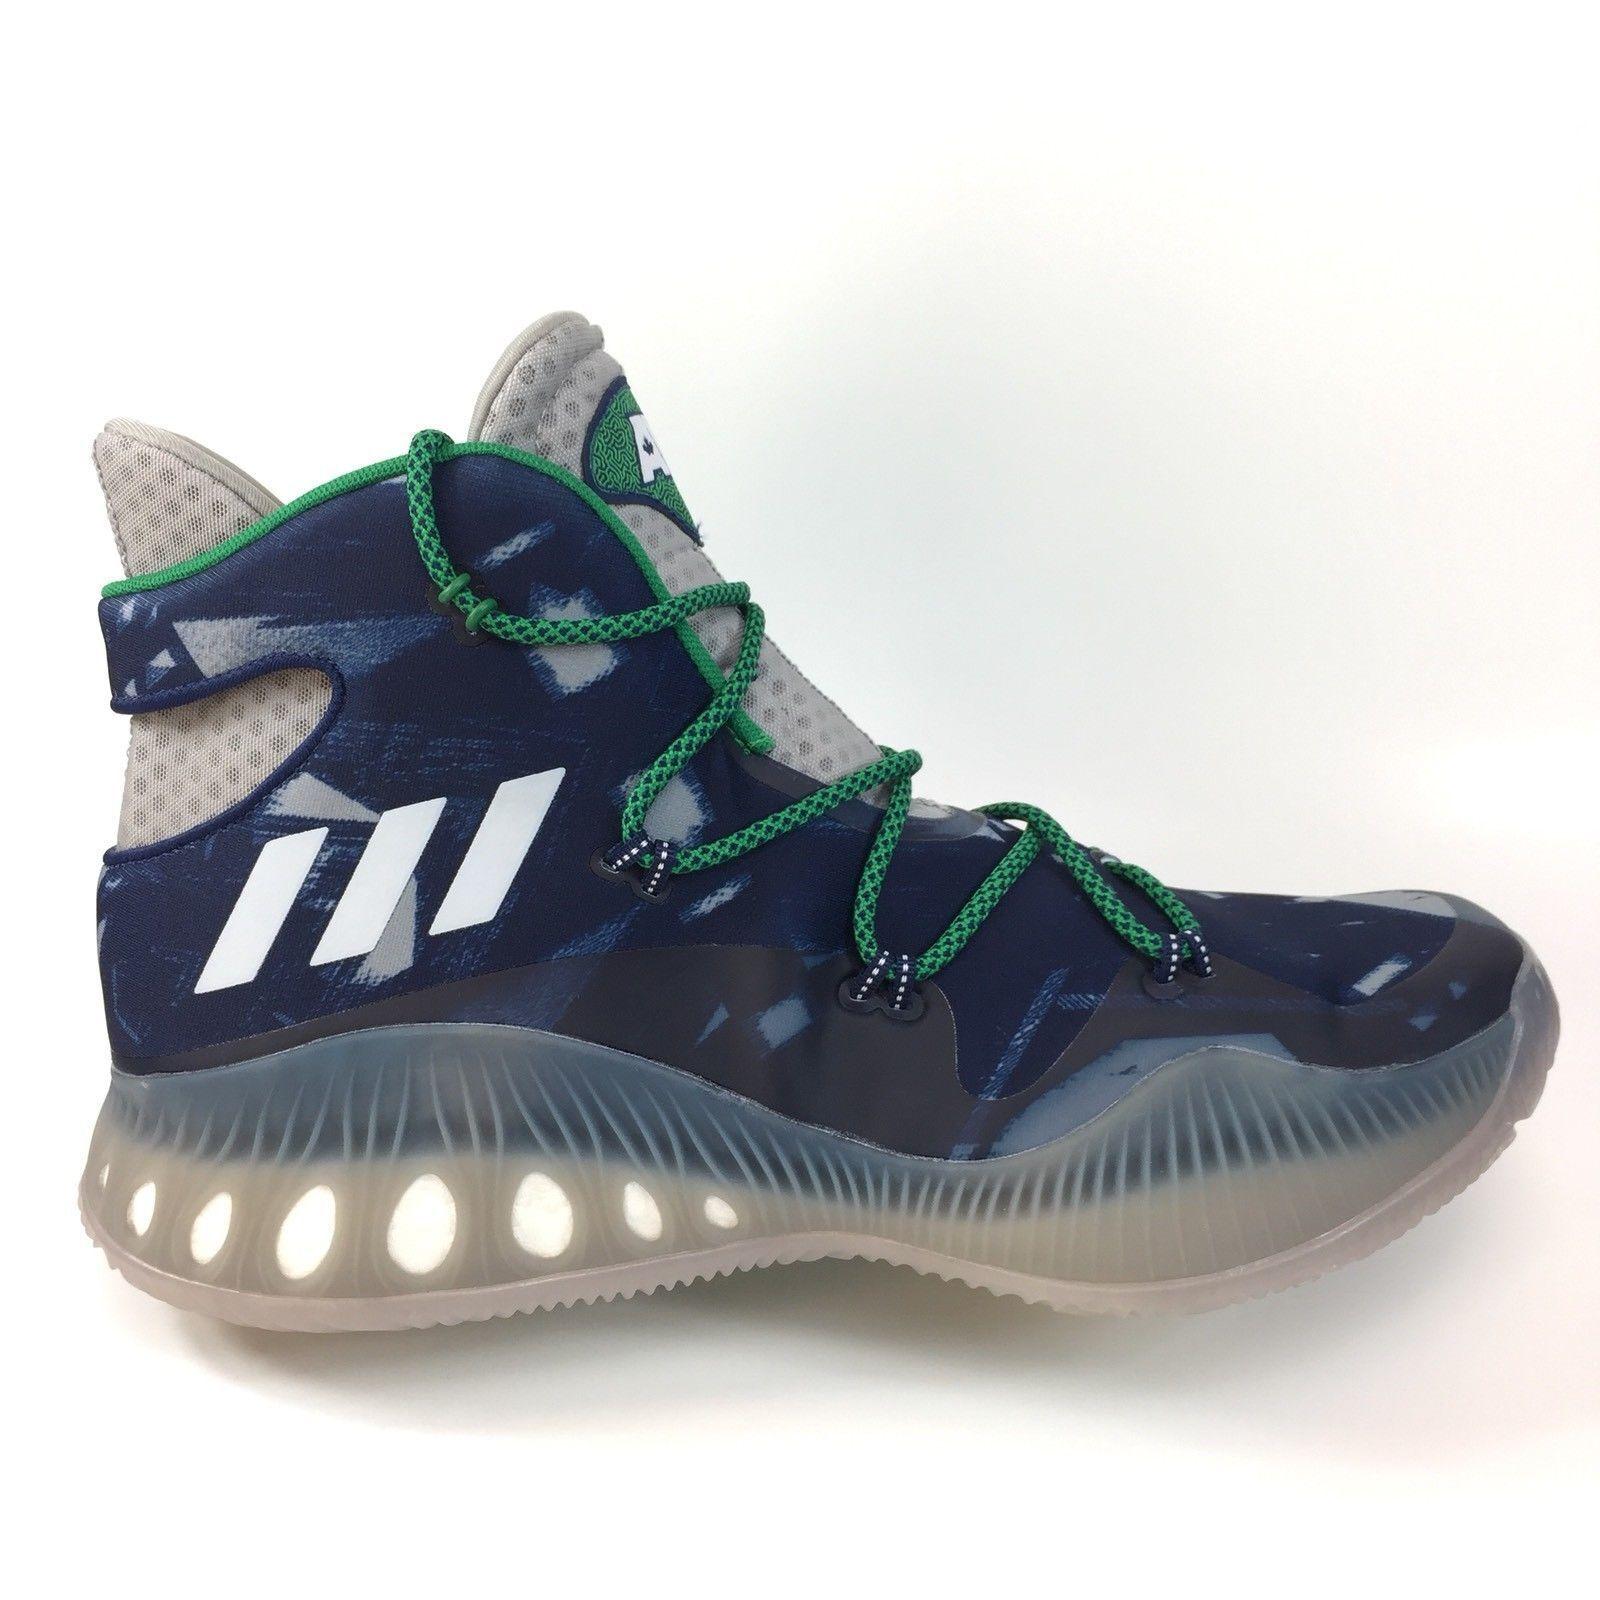 Adidas Men AW Crazy Schuhe Explosive ANDREW WIGGINS Basketball Schuhe Crazy BB8345 NAVY Blau 17 dd76d2